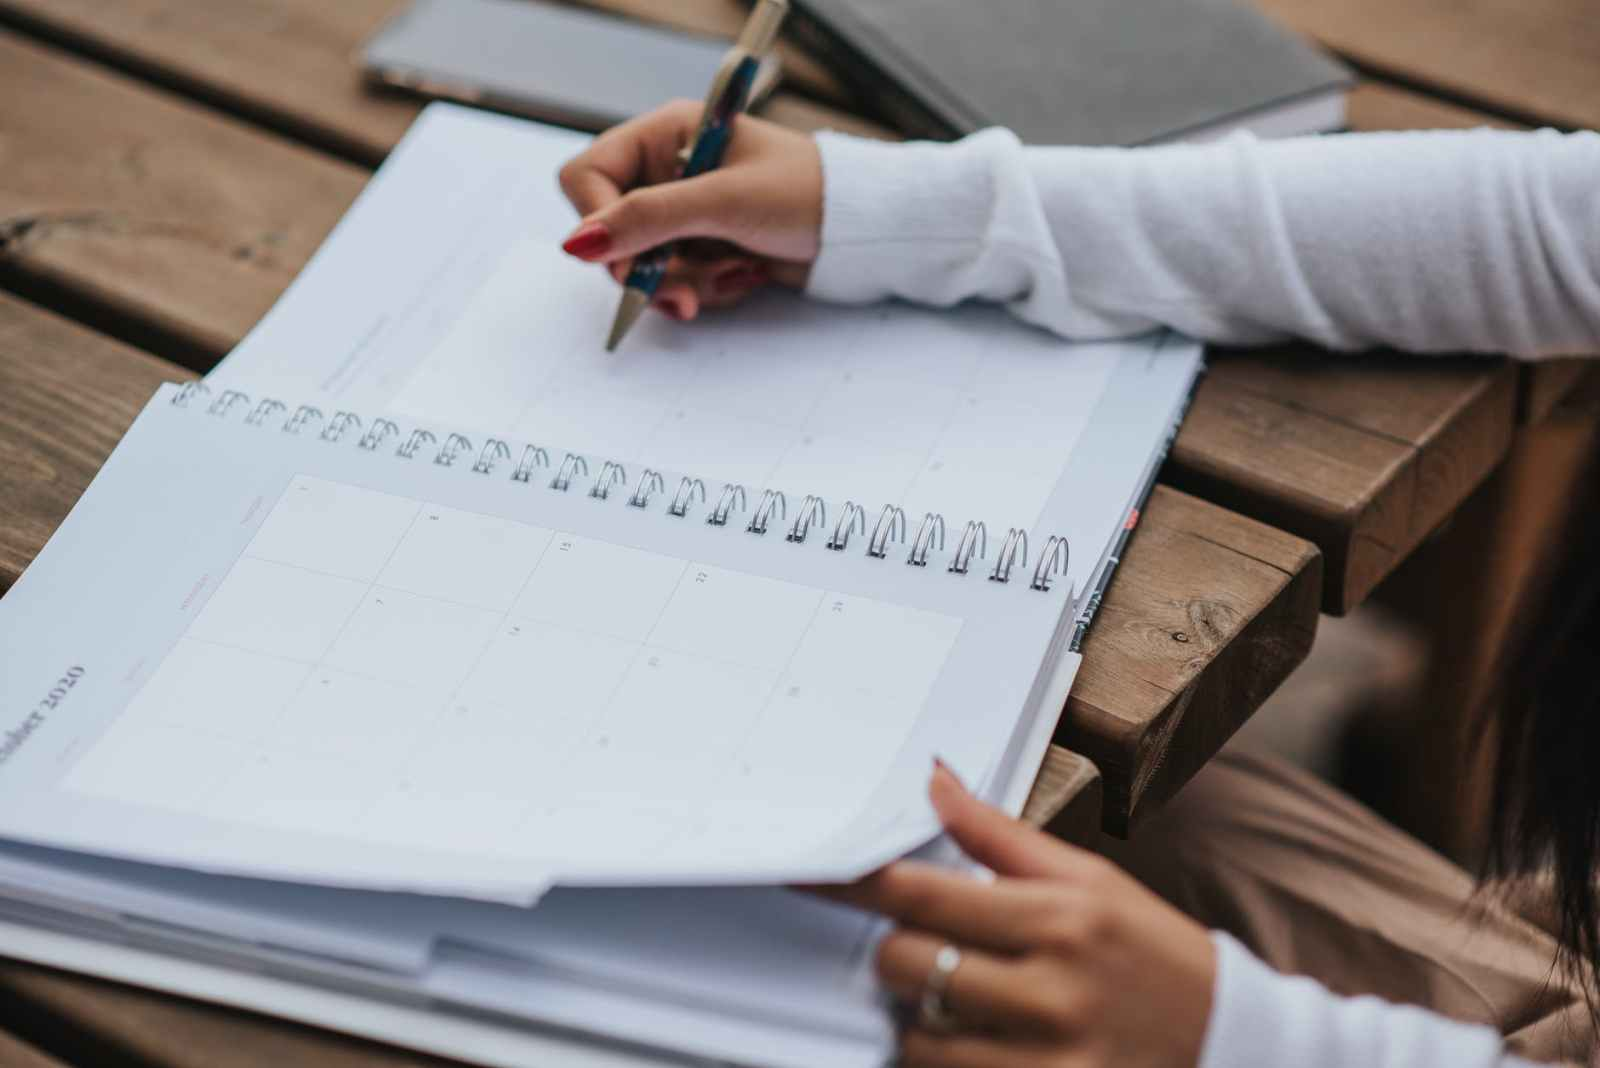 crop woman making schedule in planner